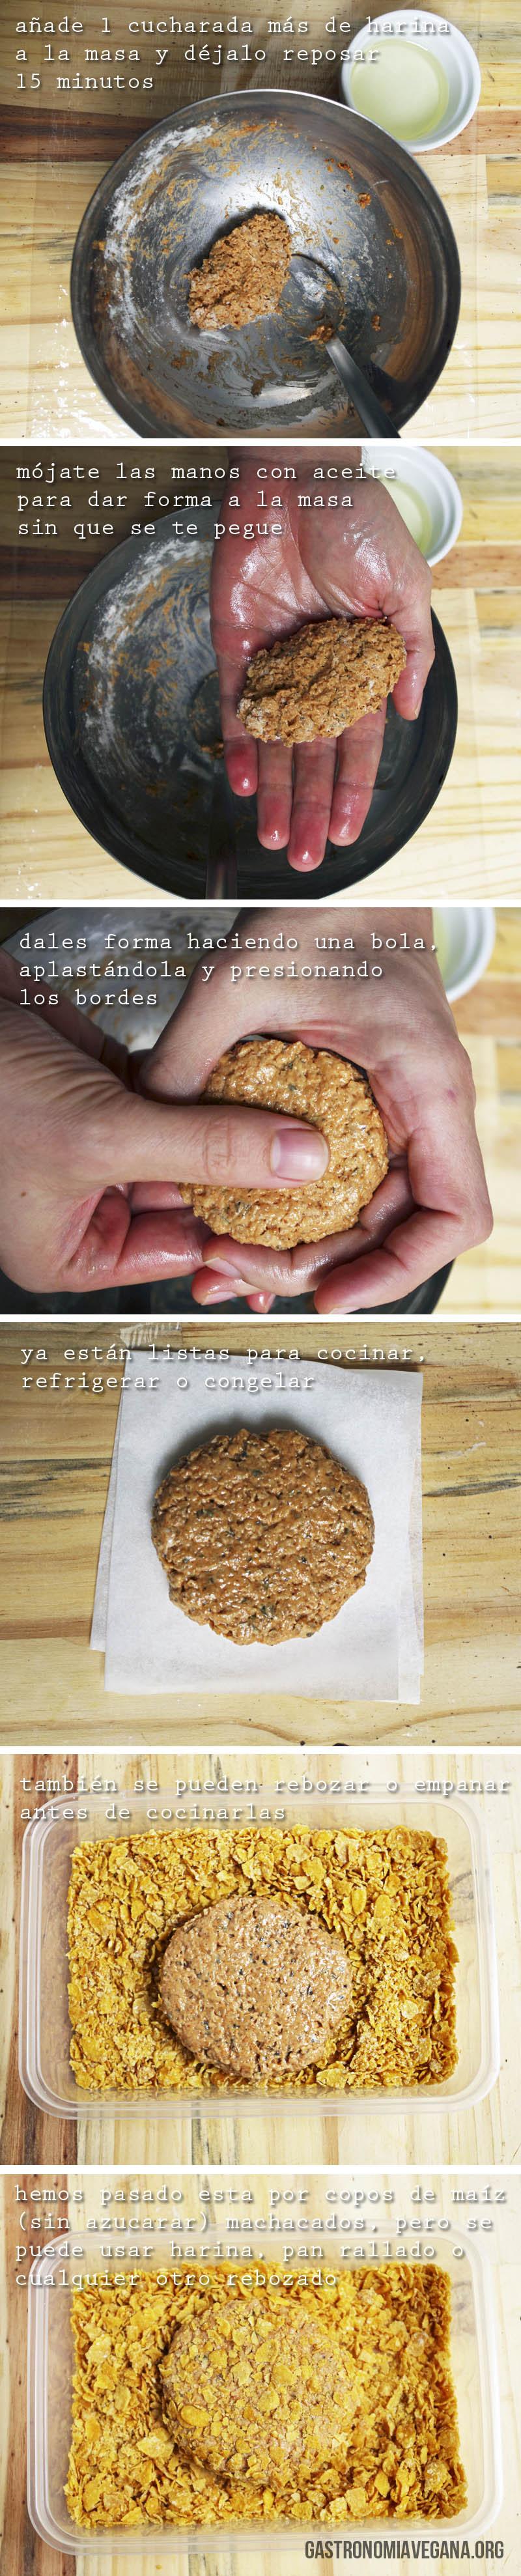 Tutorial para hacer hamburguesas veganas a mano